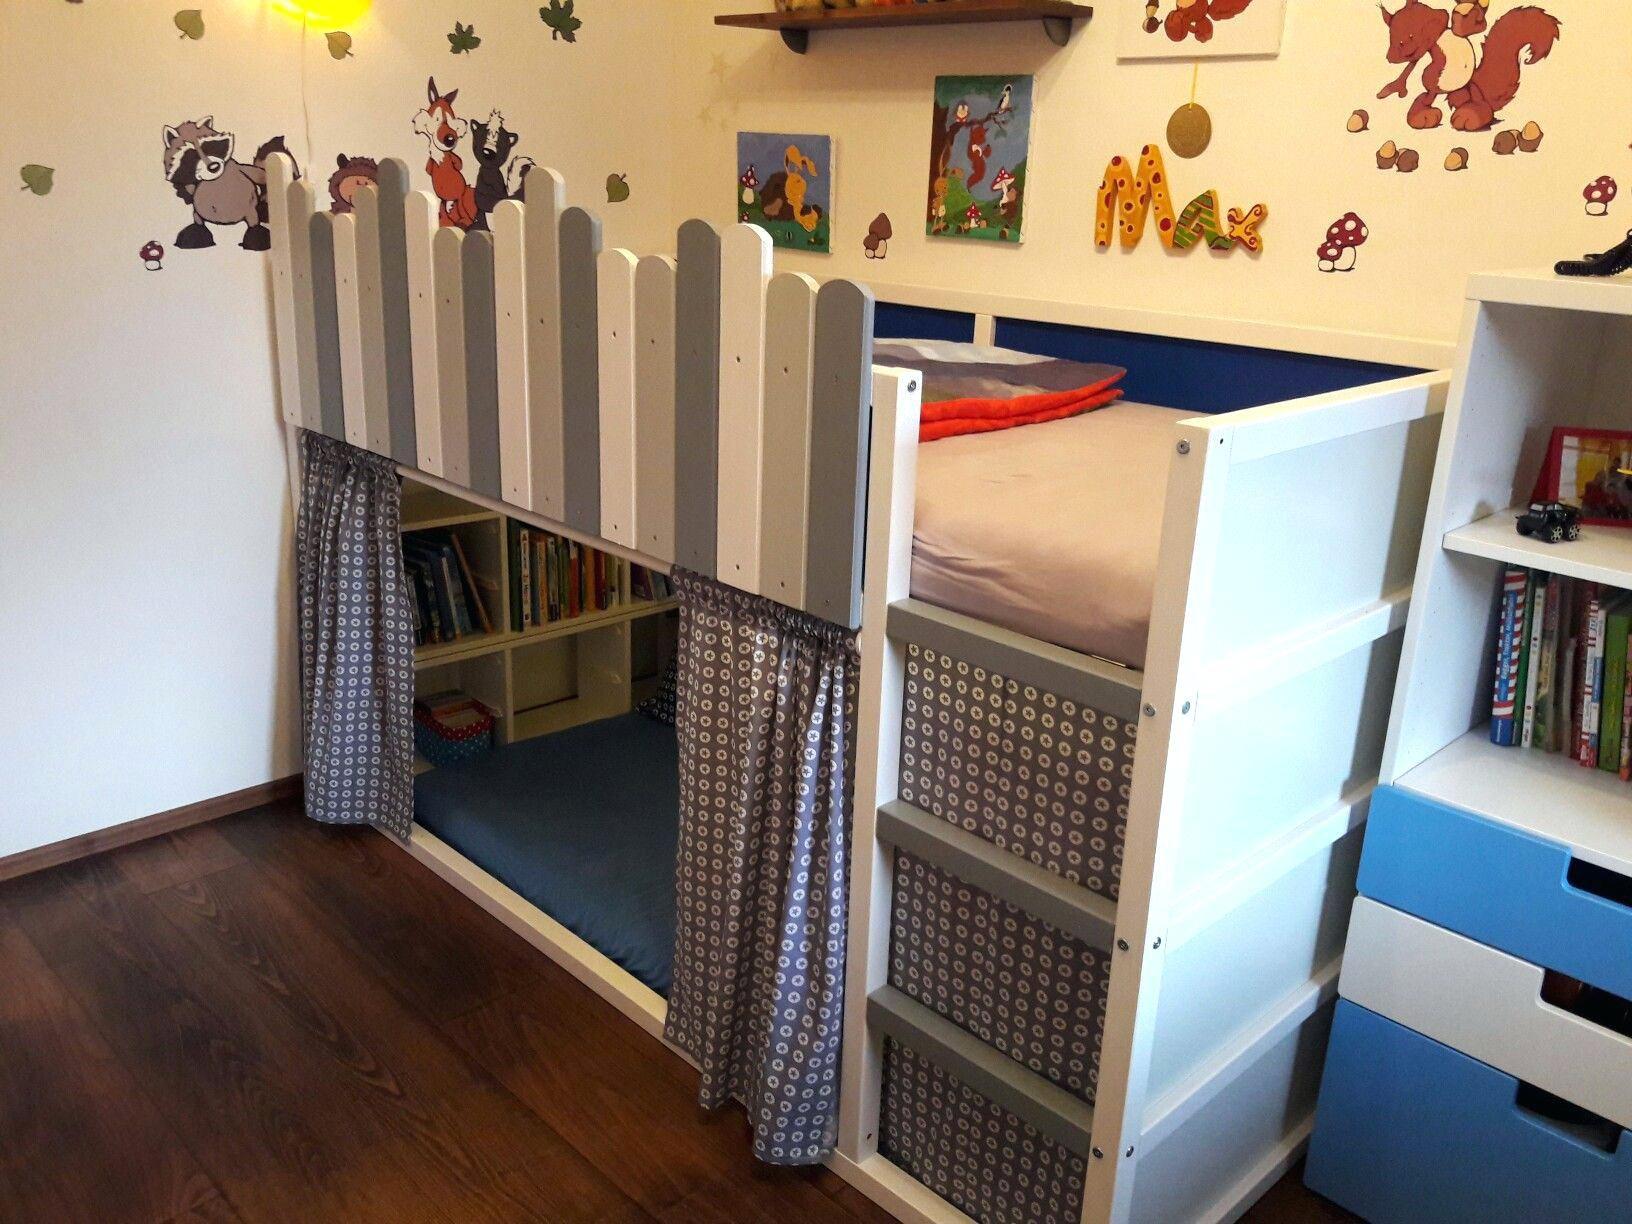 Etagenbett Diy : Madchenbett elegante betten hochbett diy kinderzimmer madchen bett